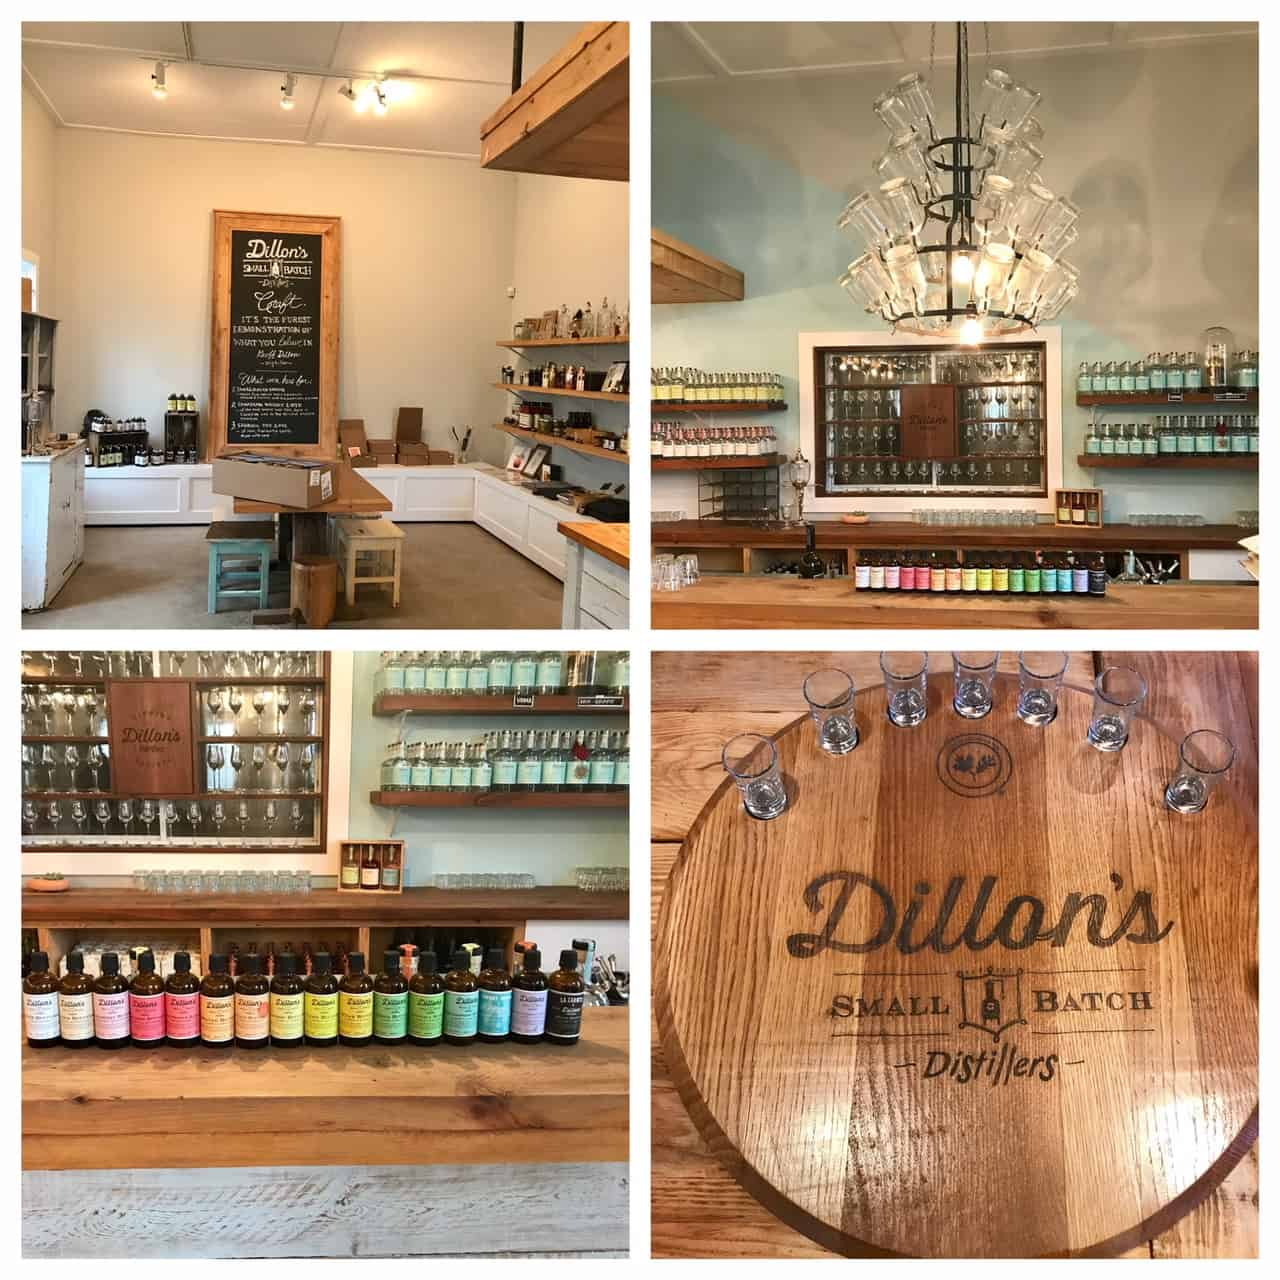 Dillons Distillery